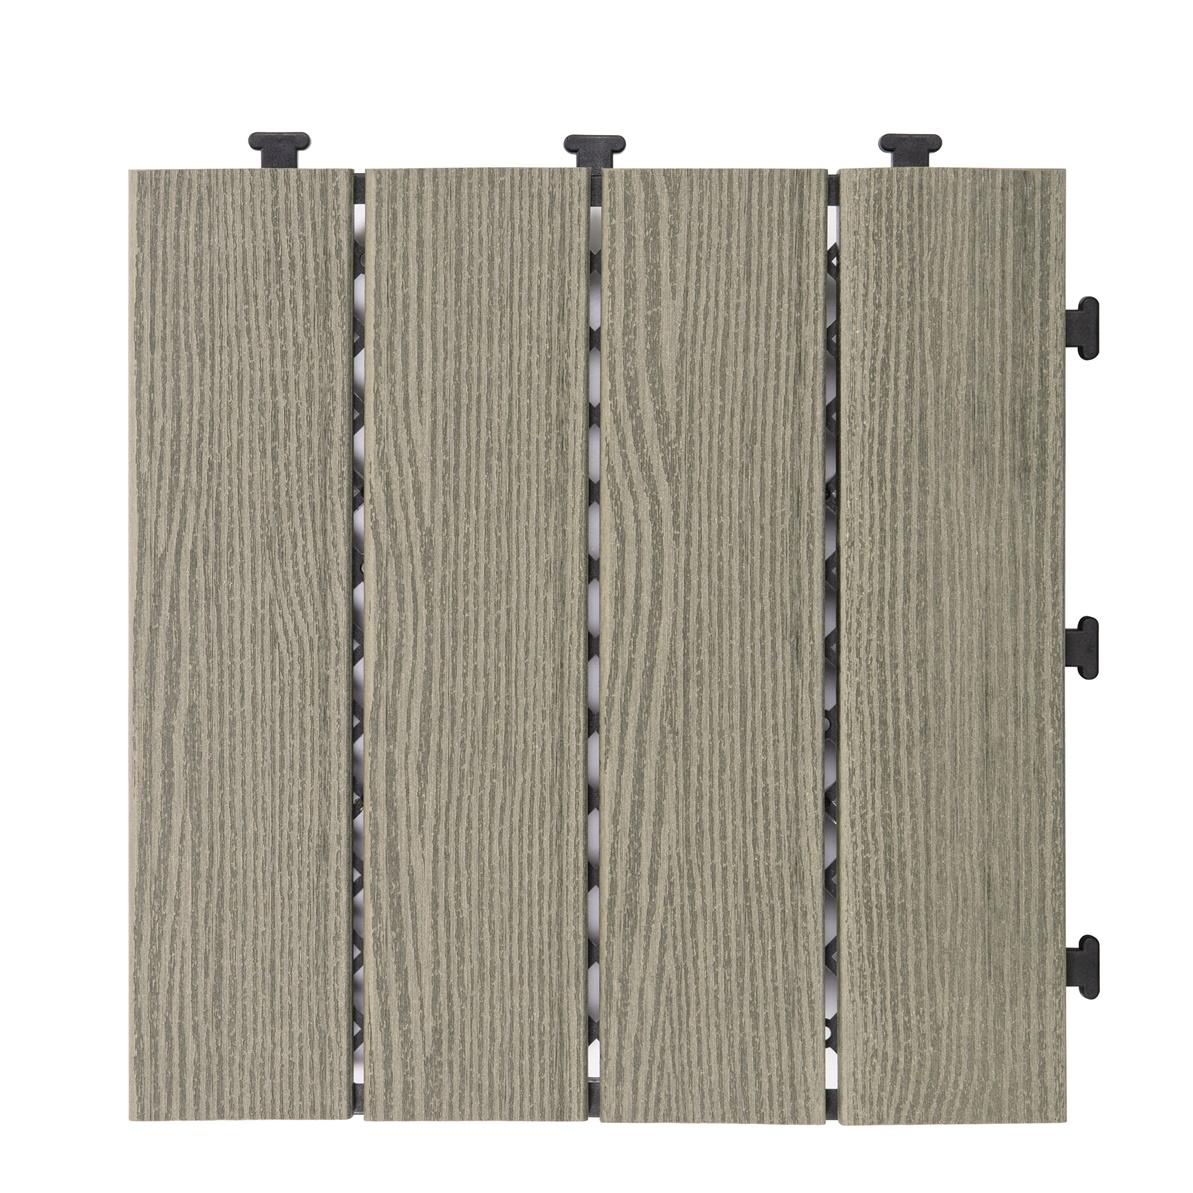 WPC Composite DIY deck tile Floor SM-4P-B BU